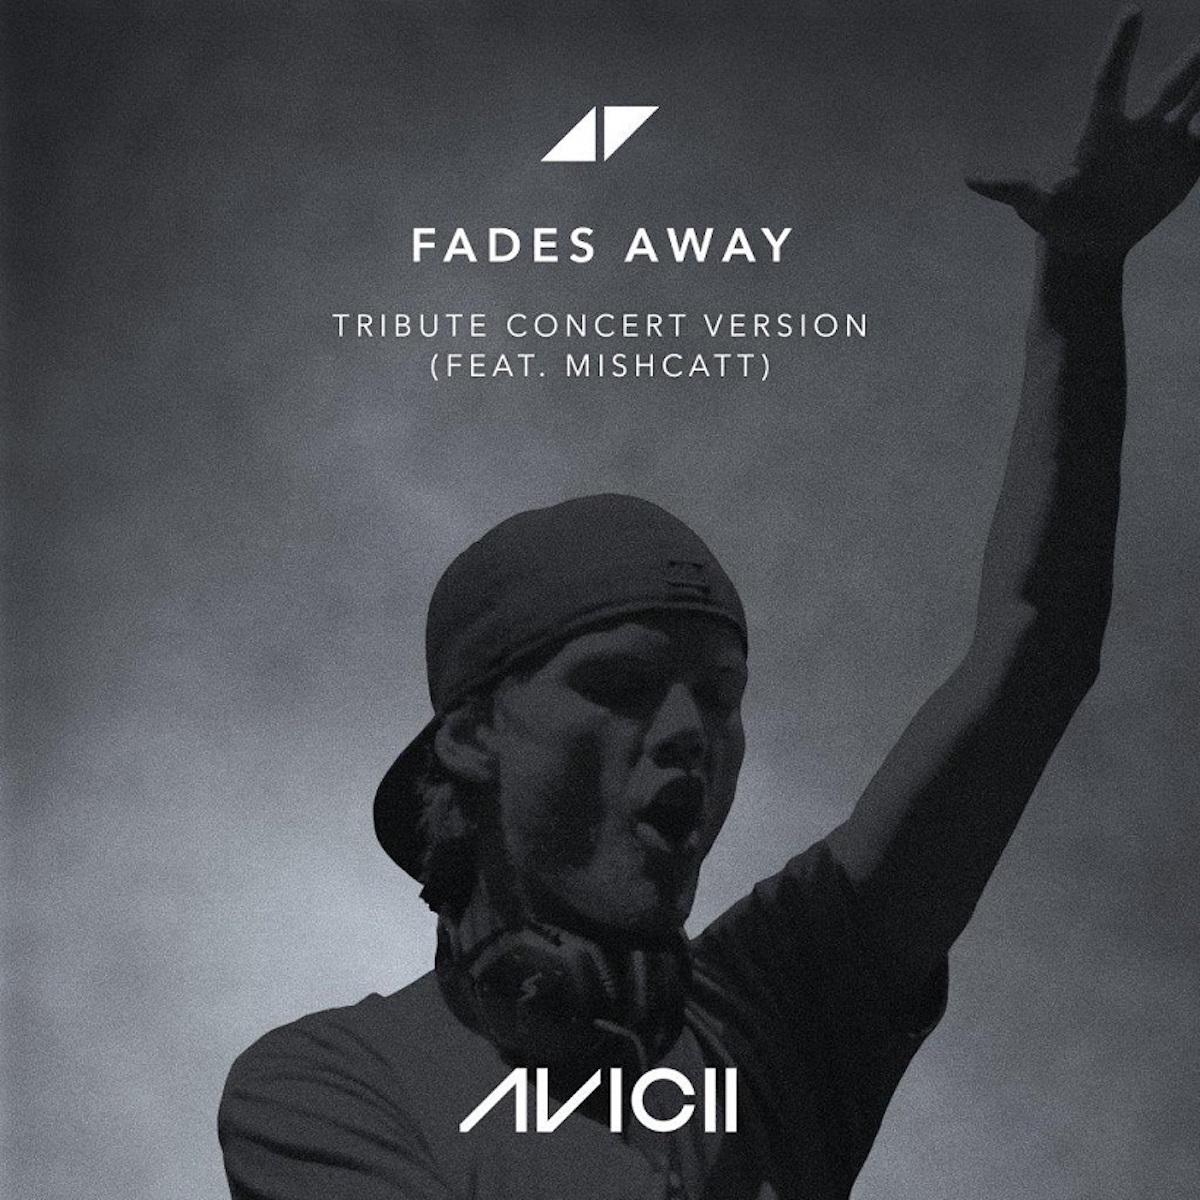 Avicii, Feat. MishCatt - Fades Away (Tribute Concert Version)